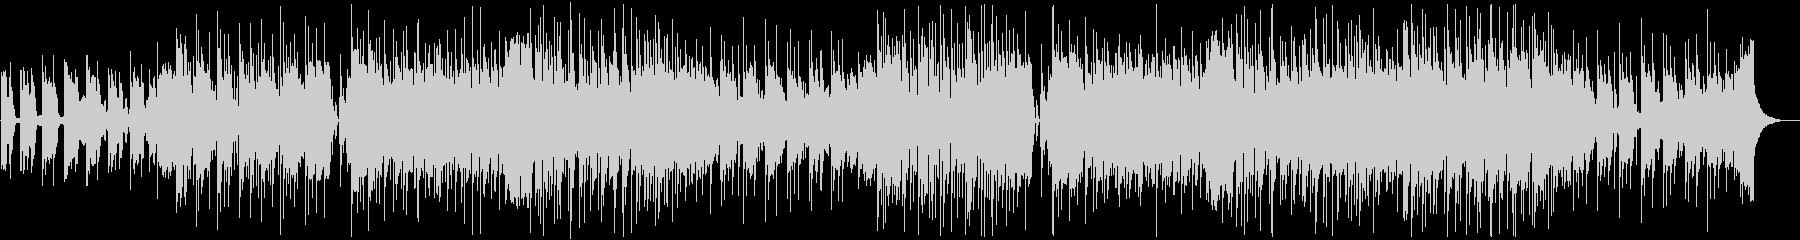 EDM系 マシュメロぽいポップな曲 -1の未再生の波形